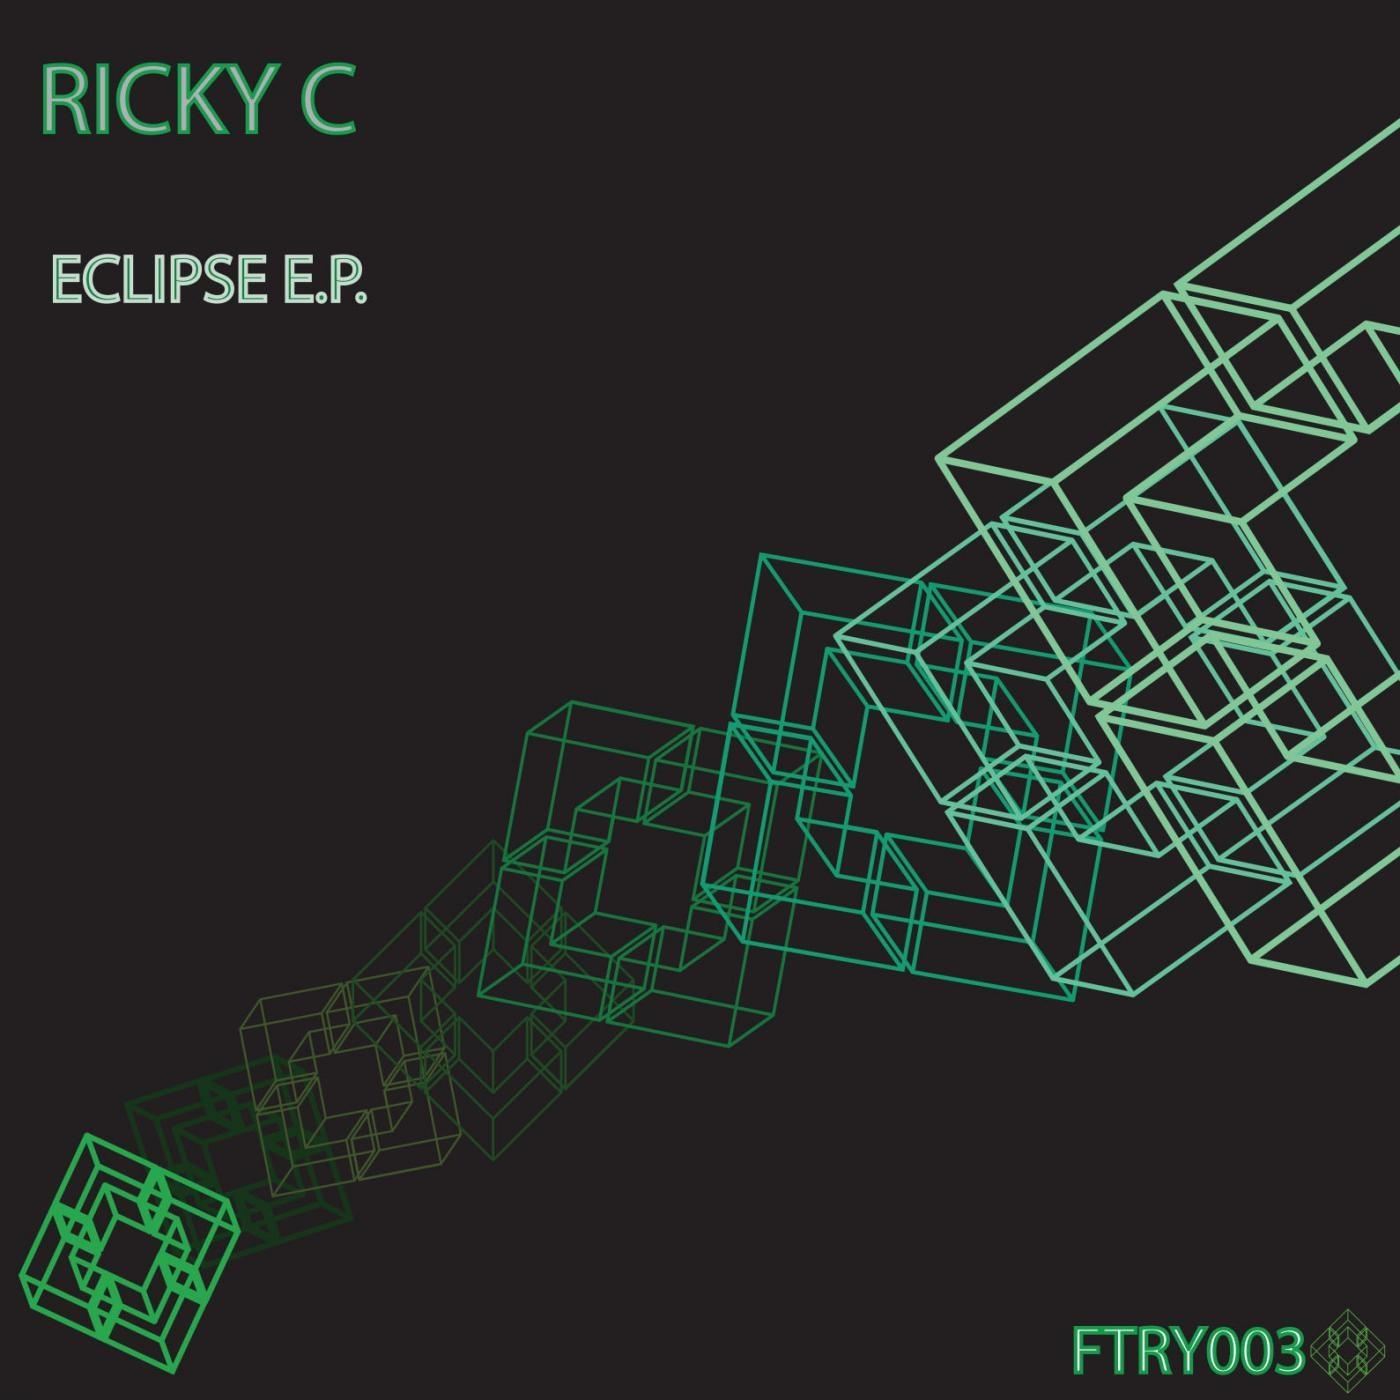 Ricky C - Fuggitivo (Original mix)